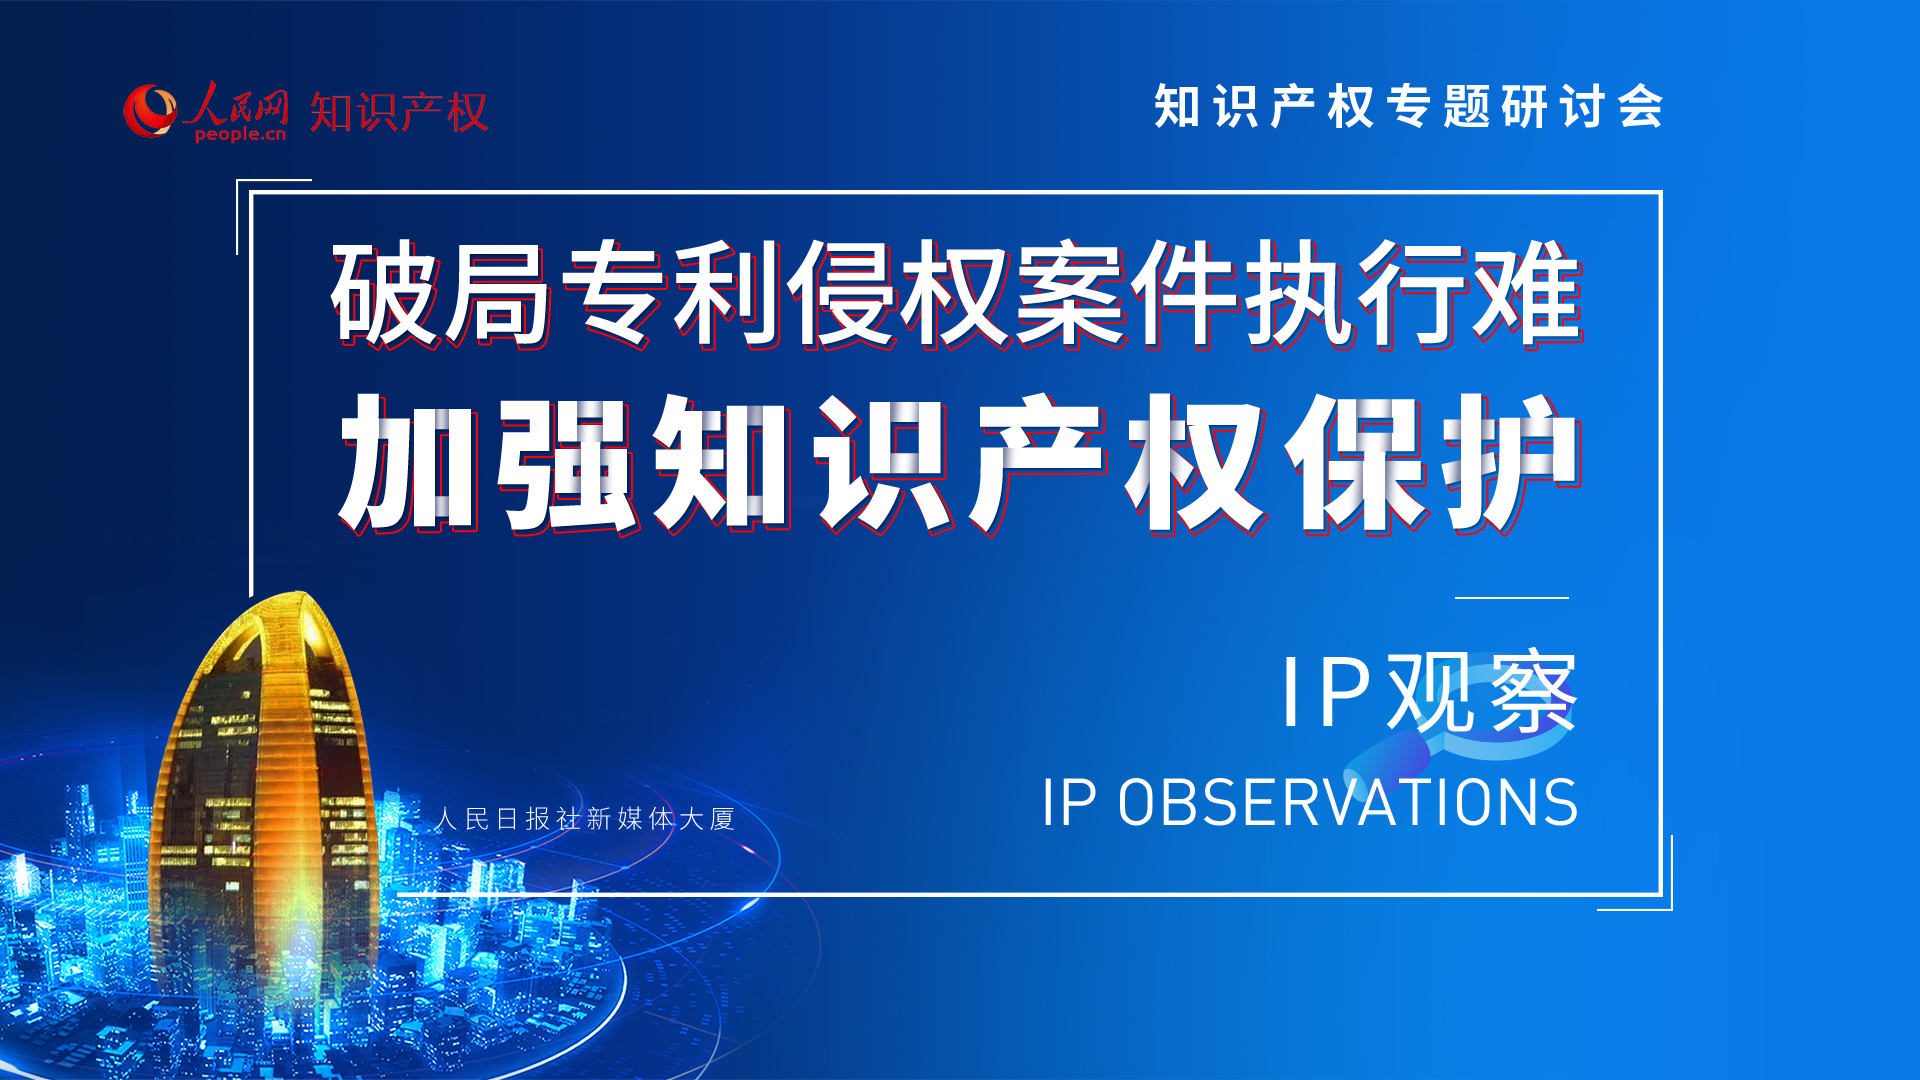 【IP观察第一期】破局专利侵权案件执行难 加强知识产权保护